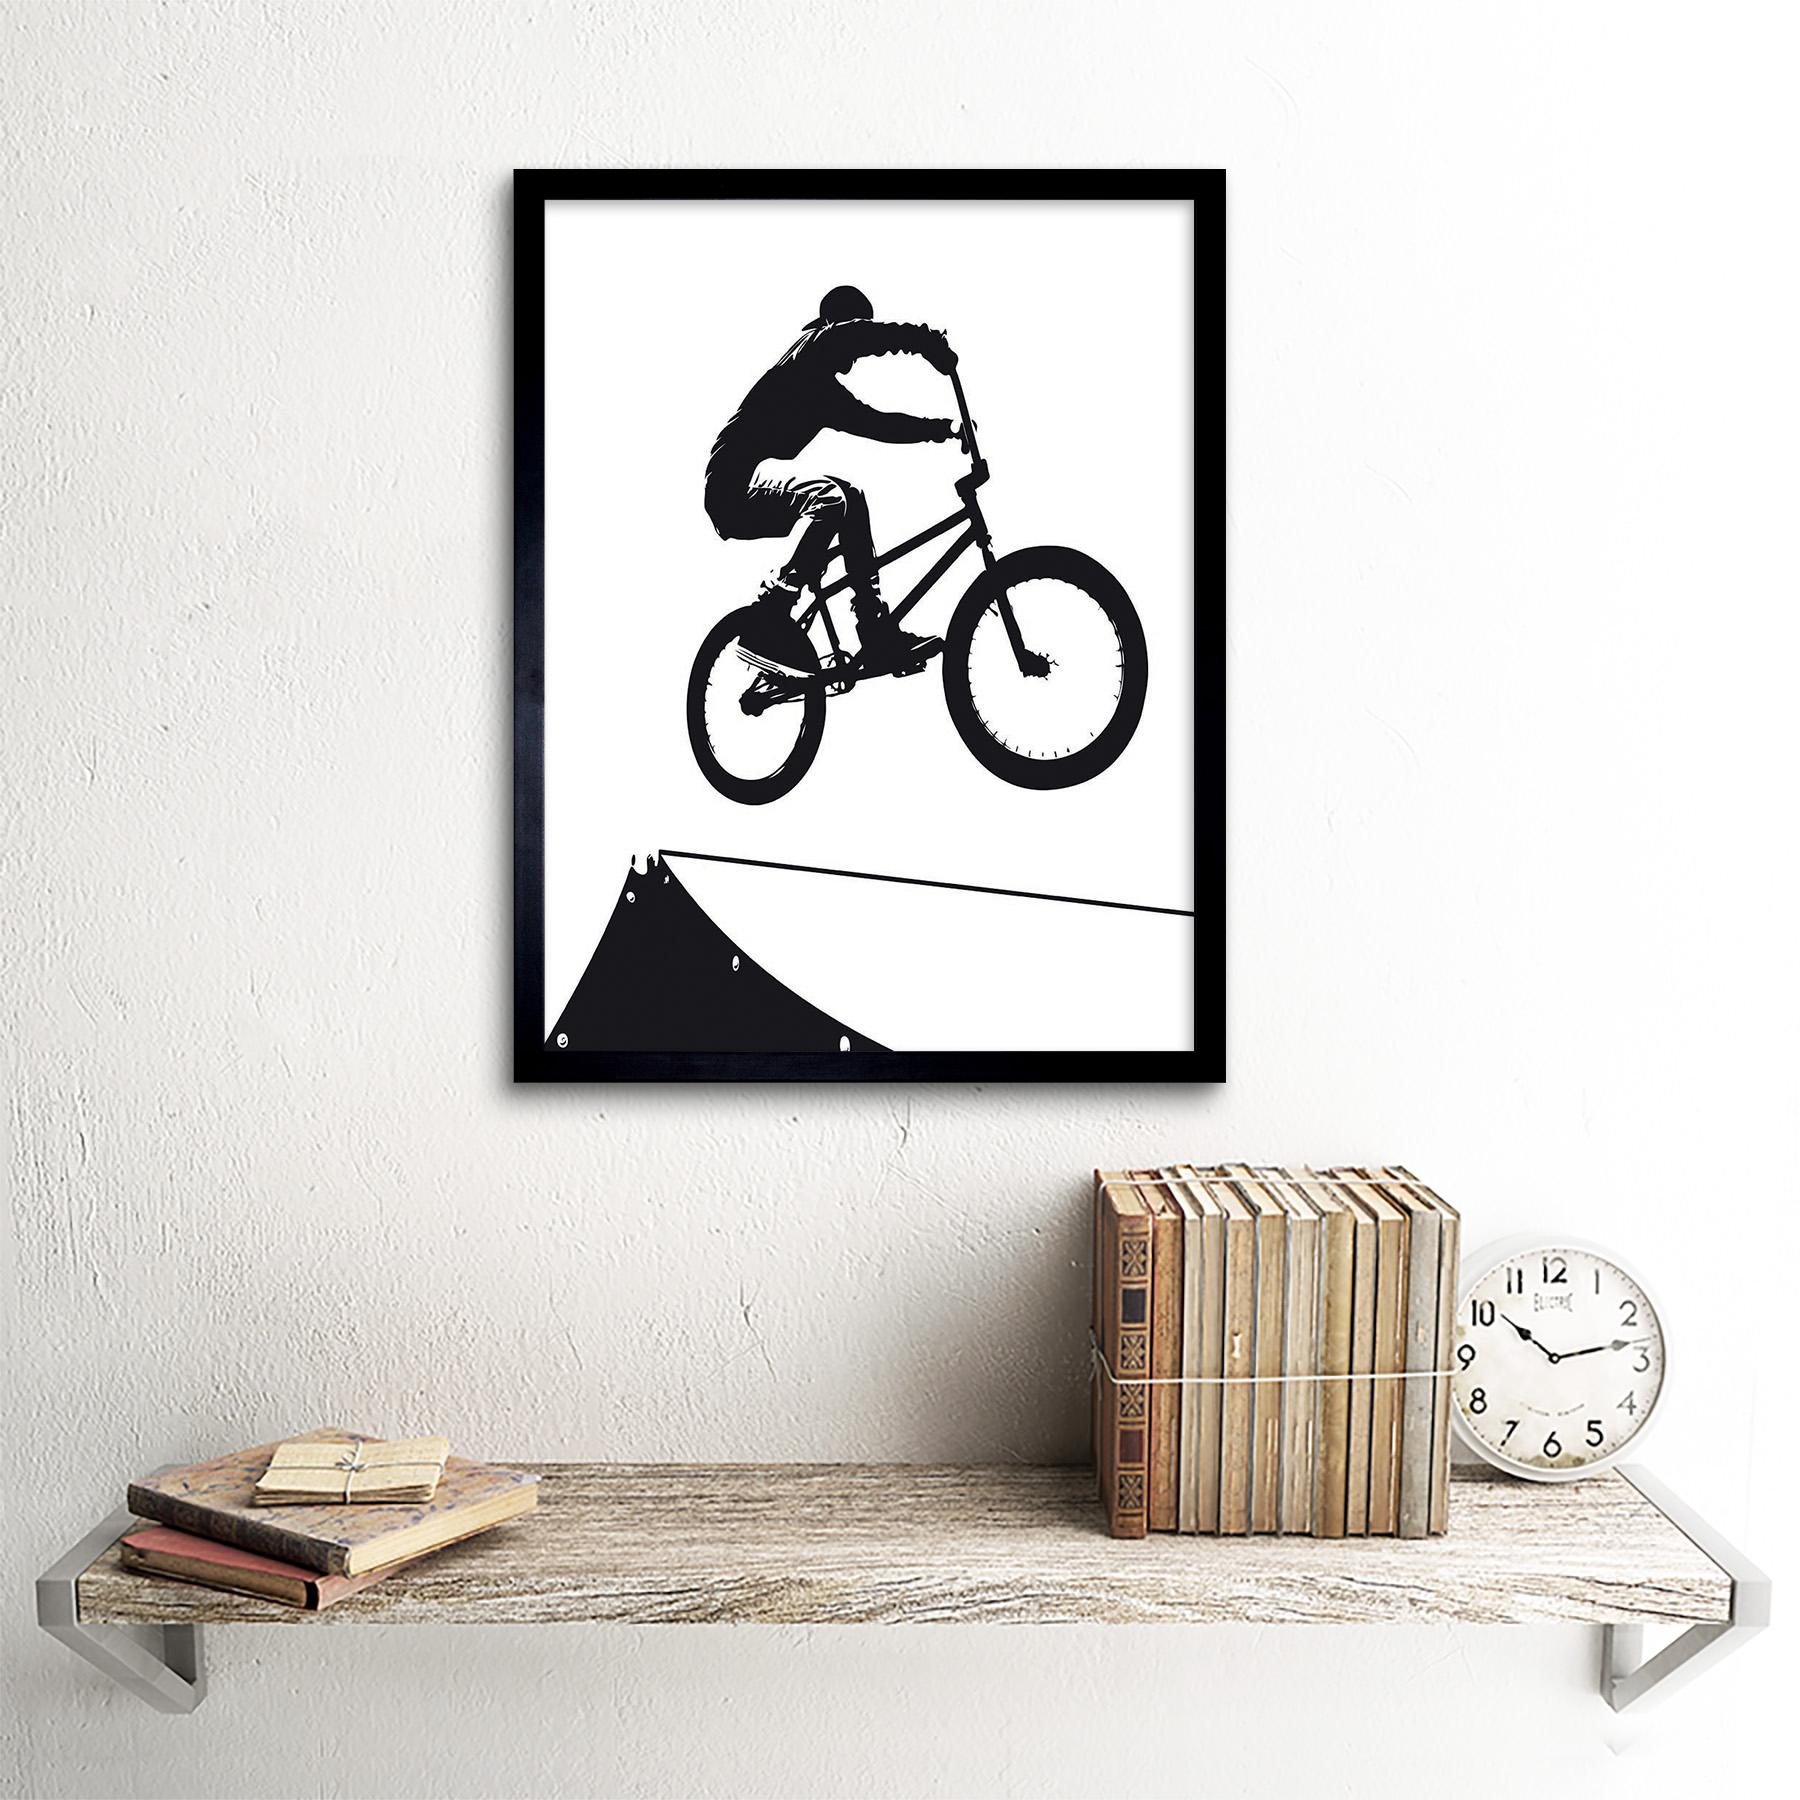 Indexbild 3 - Painting Sport Bmx Bike Bicycle Jump Air Ramp Black White 12X16 Framed Art Print